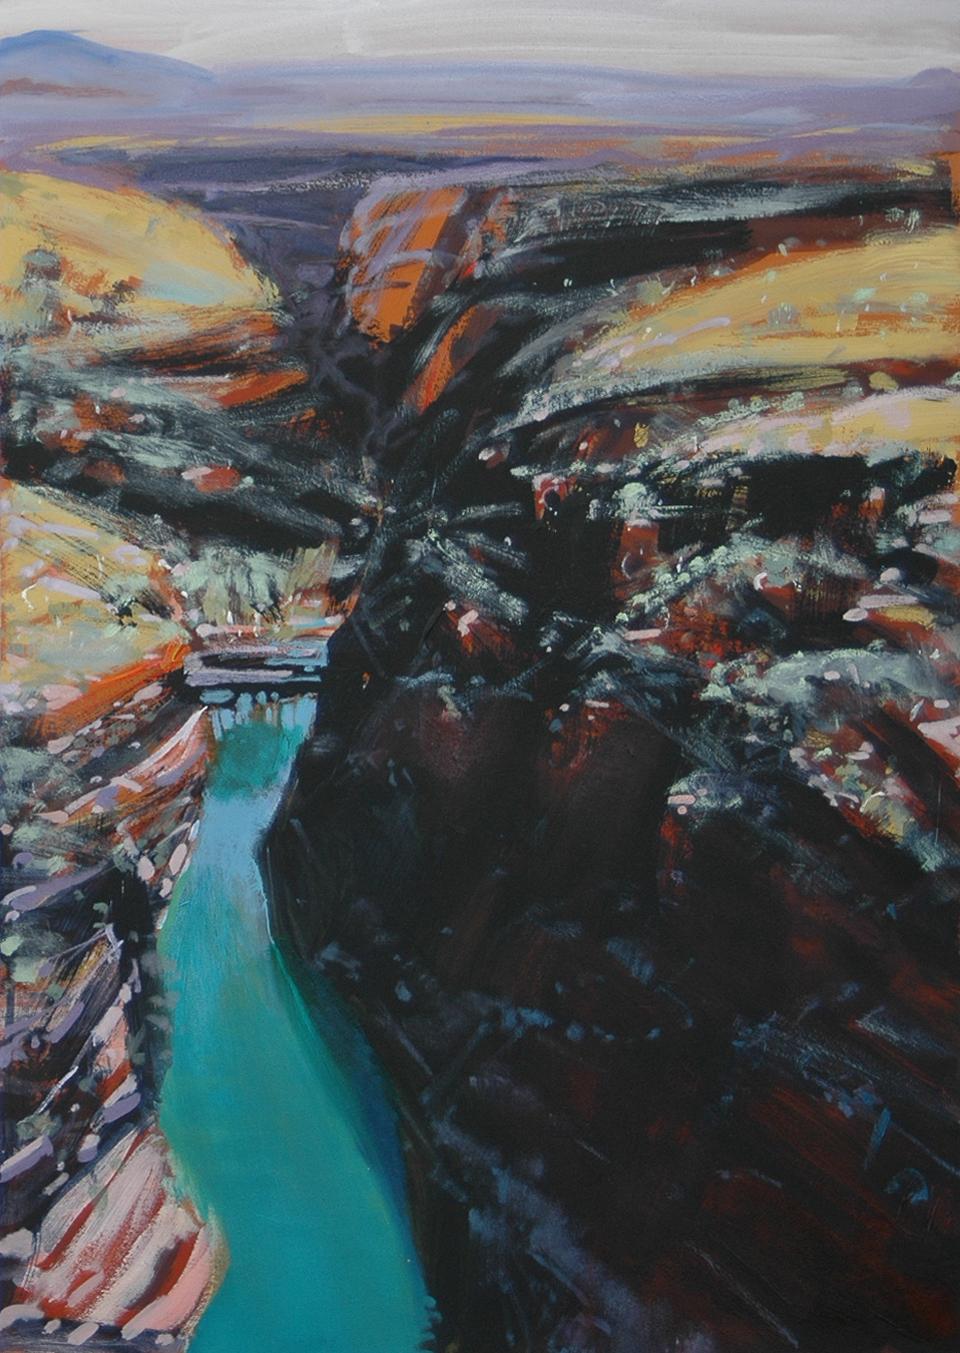 """Weano Gorge"" 67 x 47cm Mixed Media on Paper"